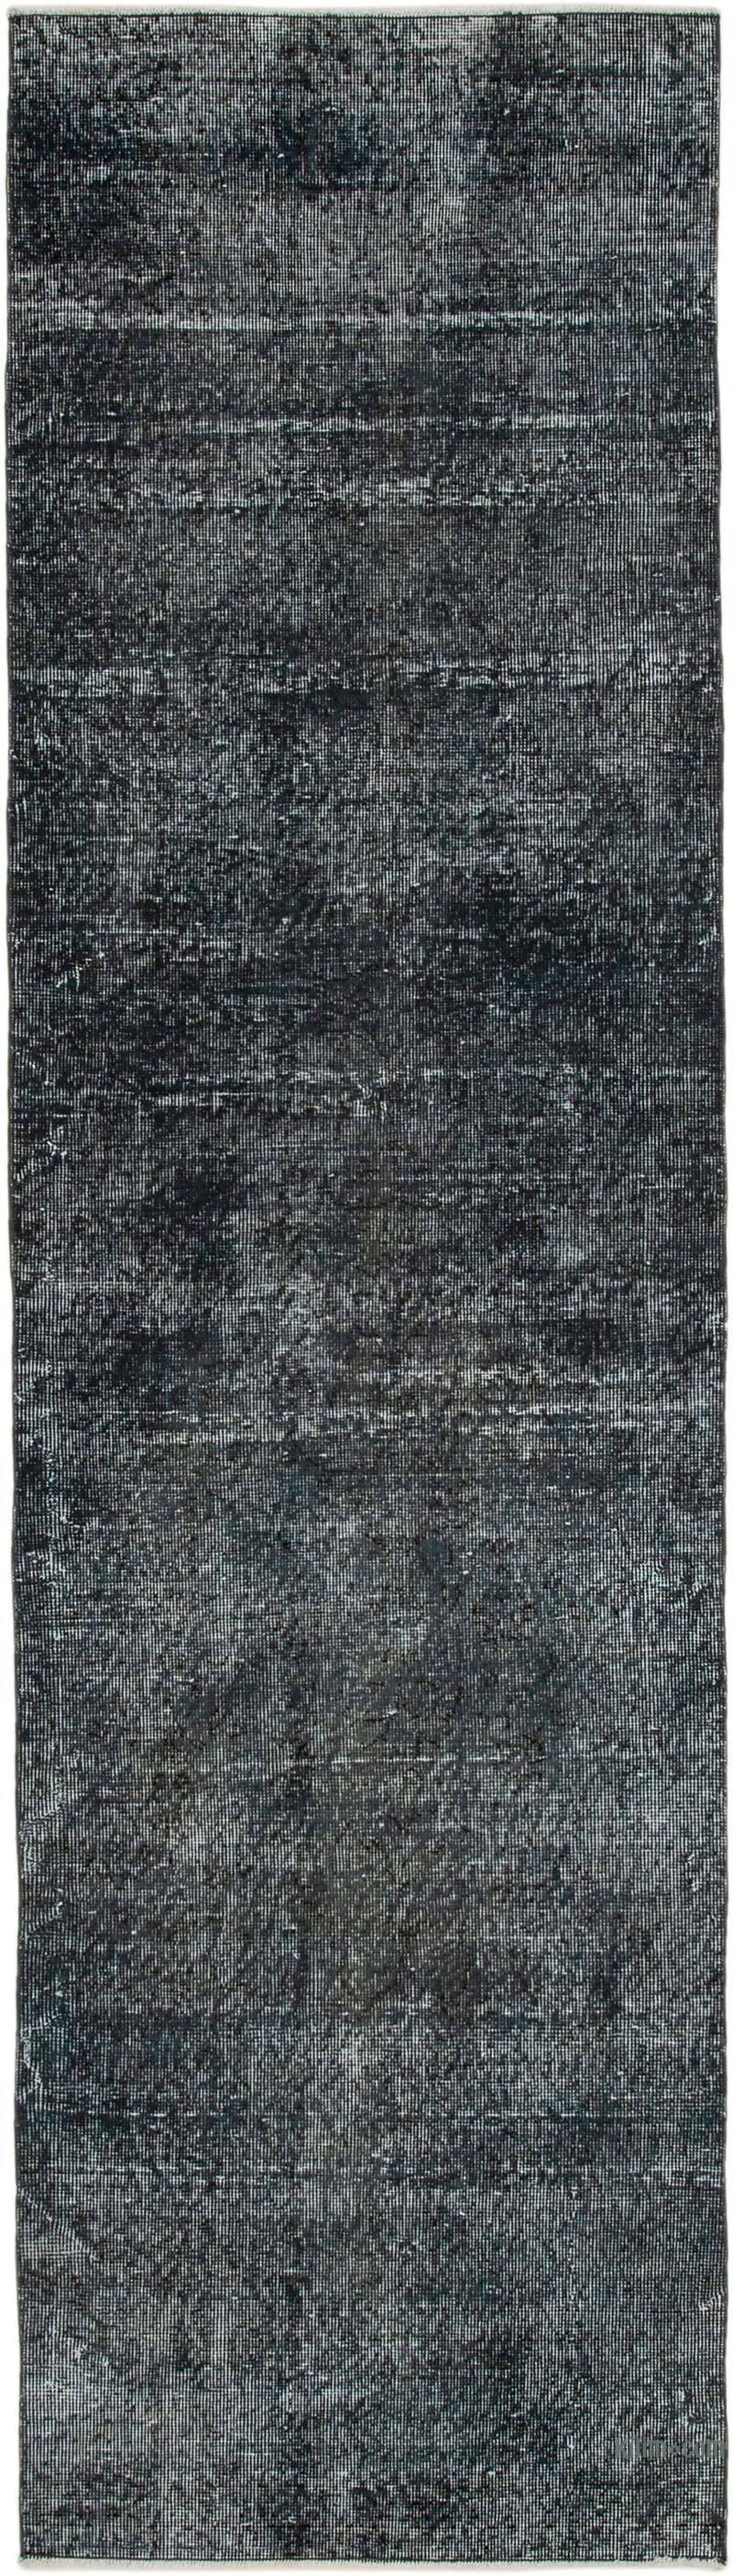 "Grey Over-dyed Turkish Vintage Runner Rug - 2' 7"" x 9' 5"" (31 in. x 113 in.) - K0050156"